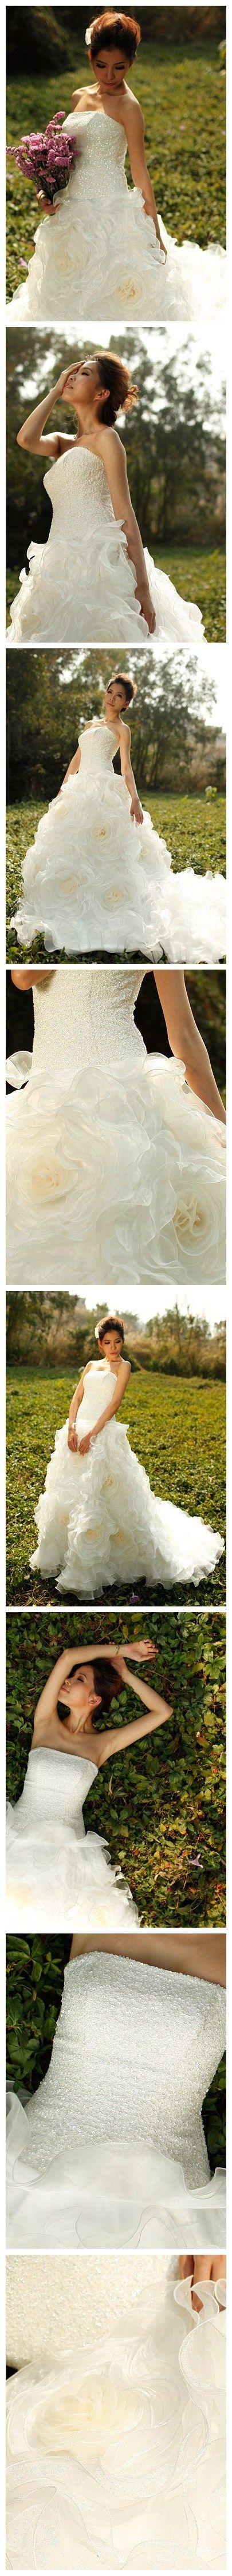 Shiny Sequin Romantic Organza Full Rose Flowering Wedding Dress